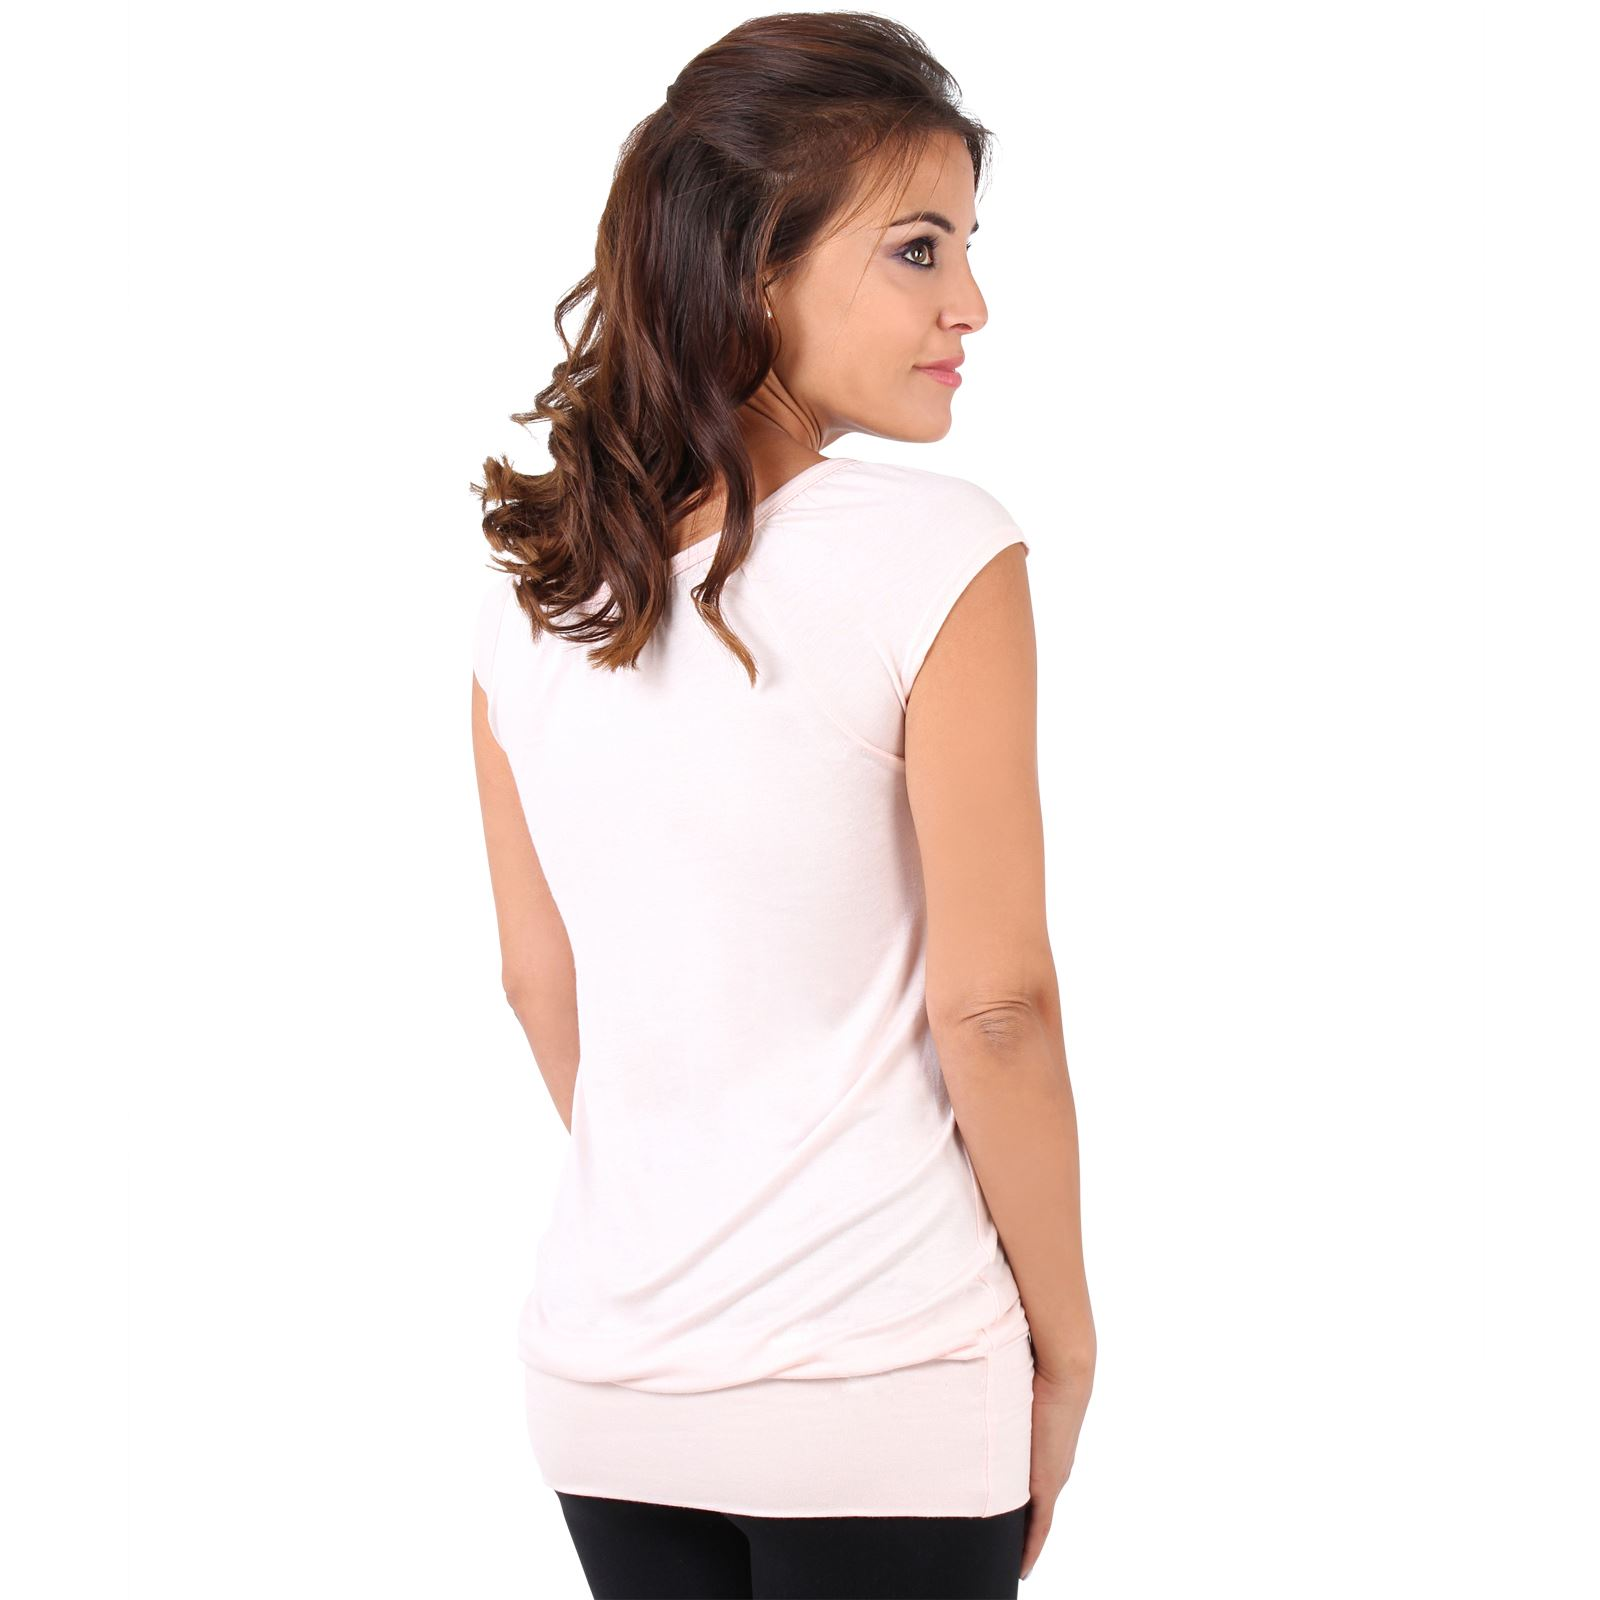 Womens-Ladies-Scoop-Neck-Blouse-V-T-Shirt-Long-Short-Sleeve-Plain-Loose-Top thumbnail 36